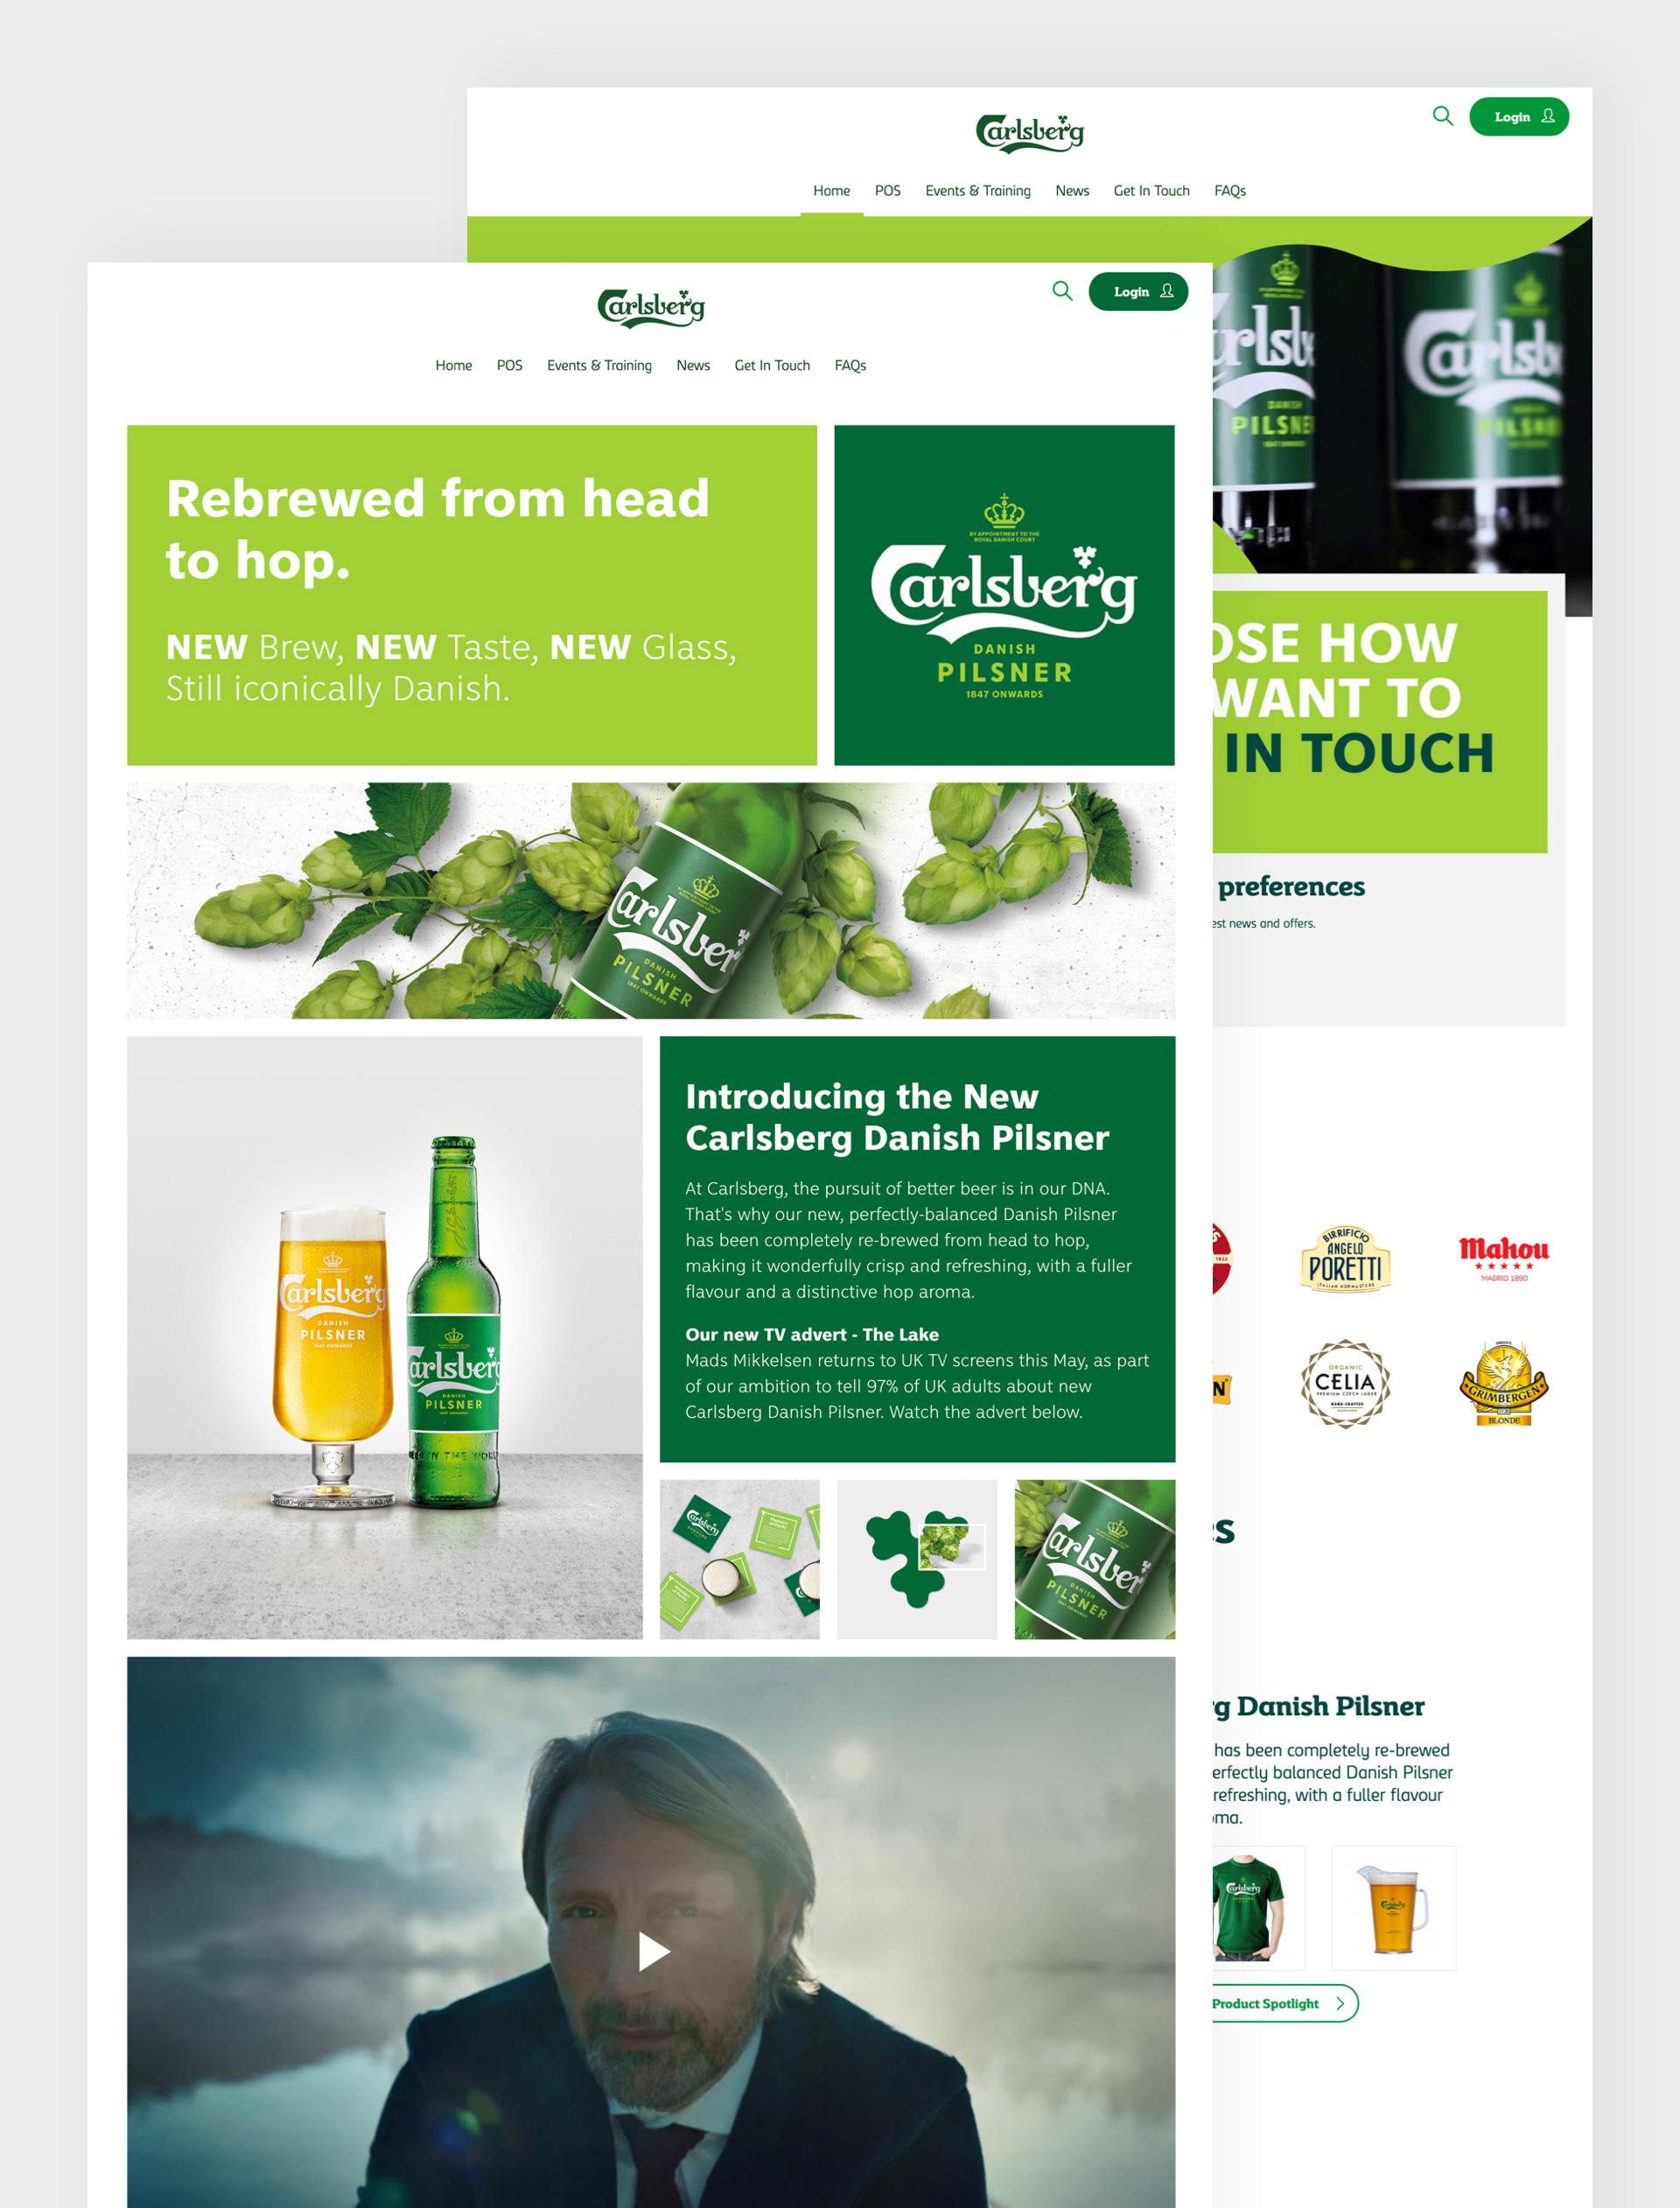 Carlsberg We Deliver More web pages